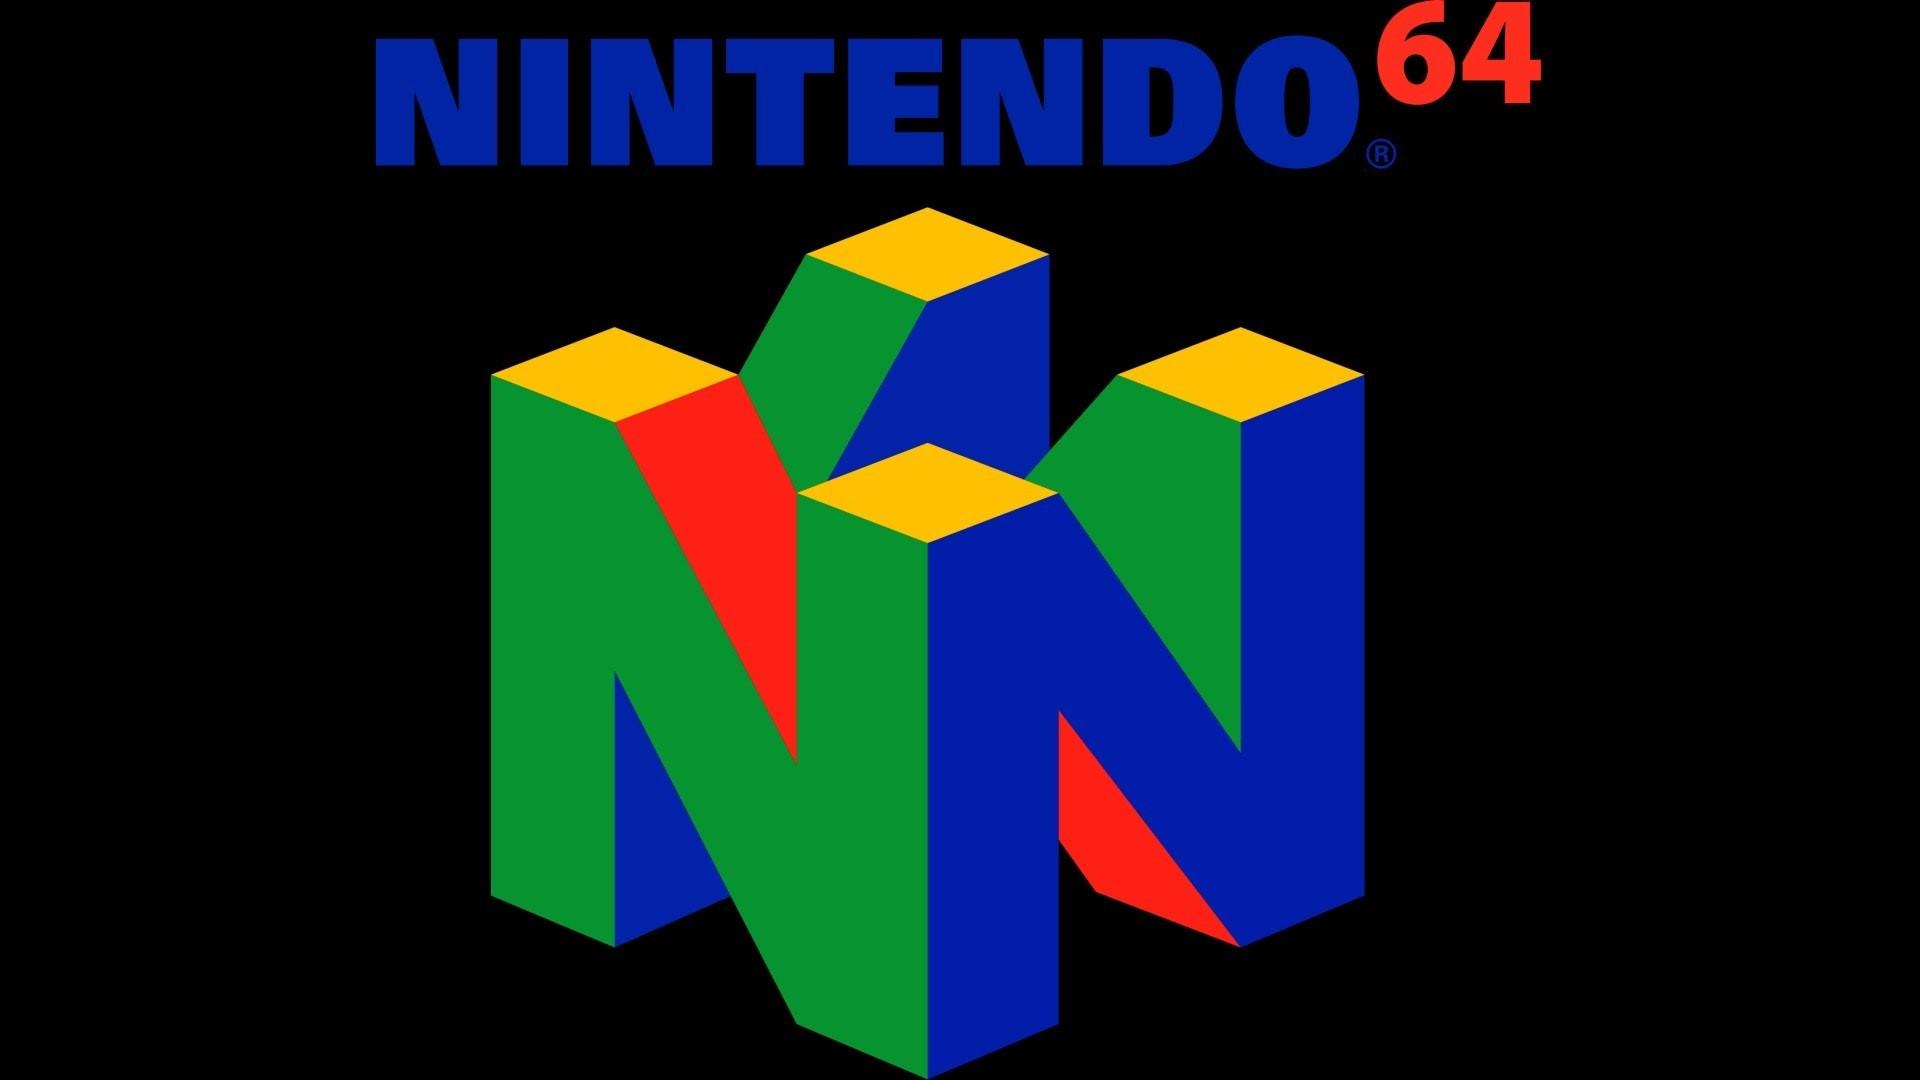 N64 Wallpaper (70+ Images